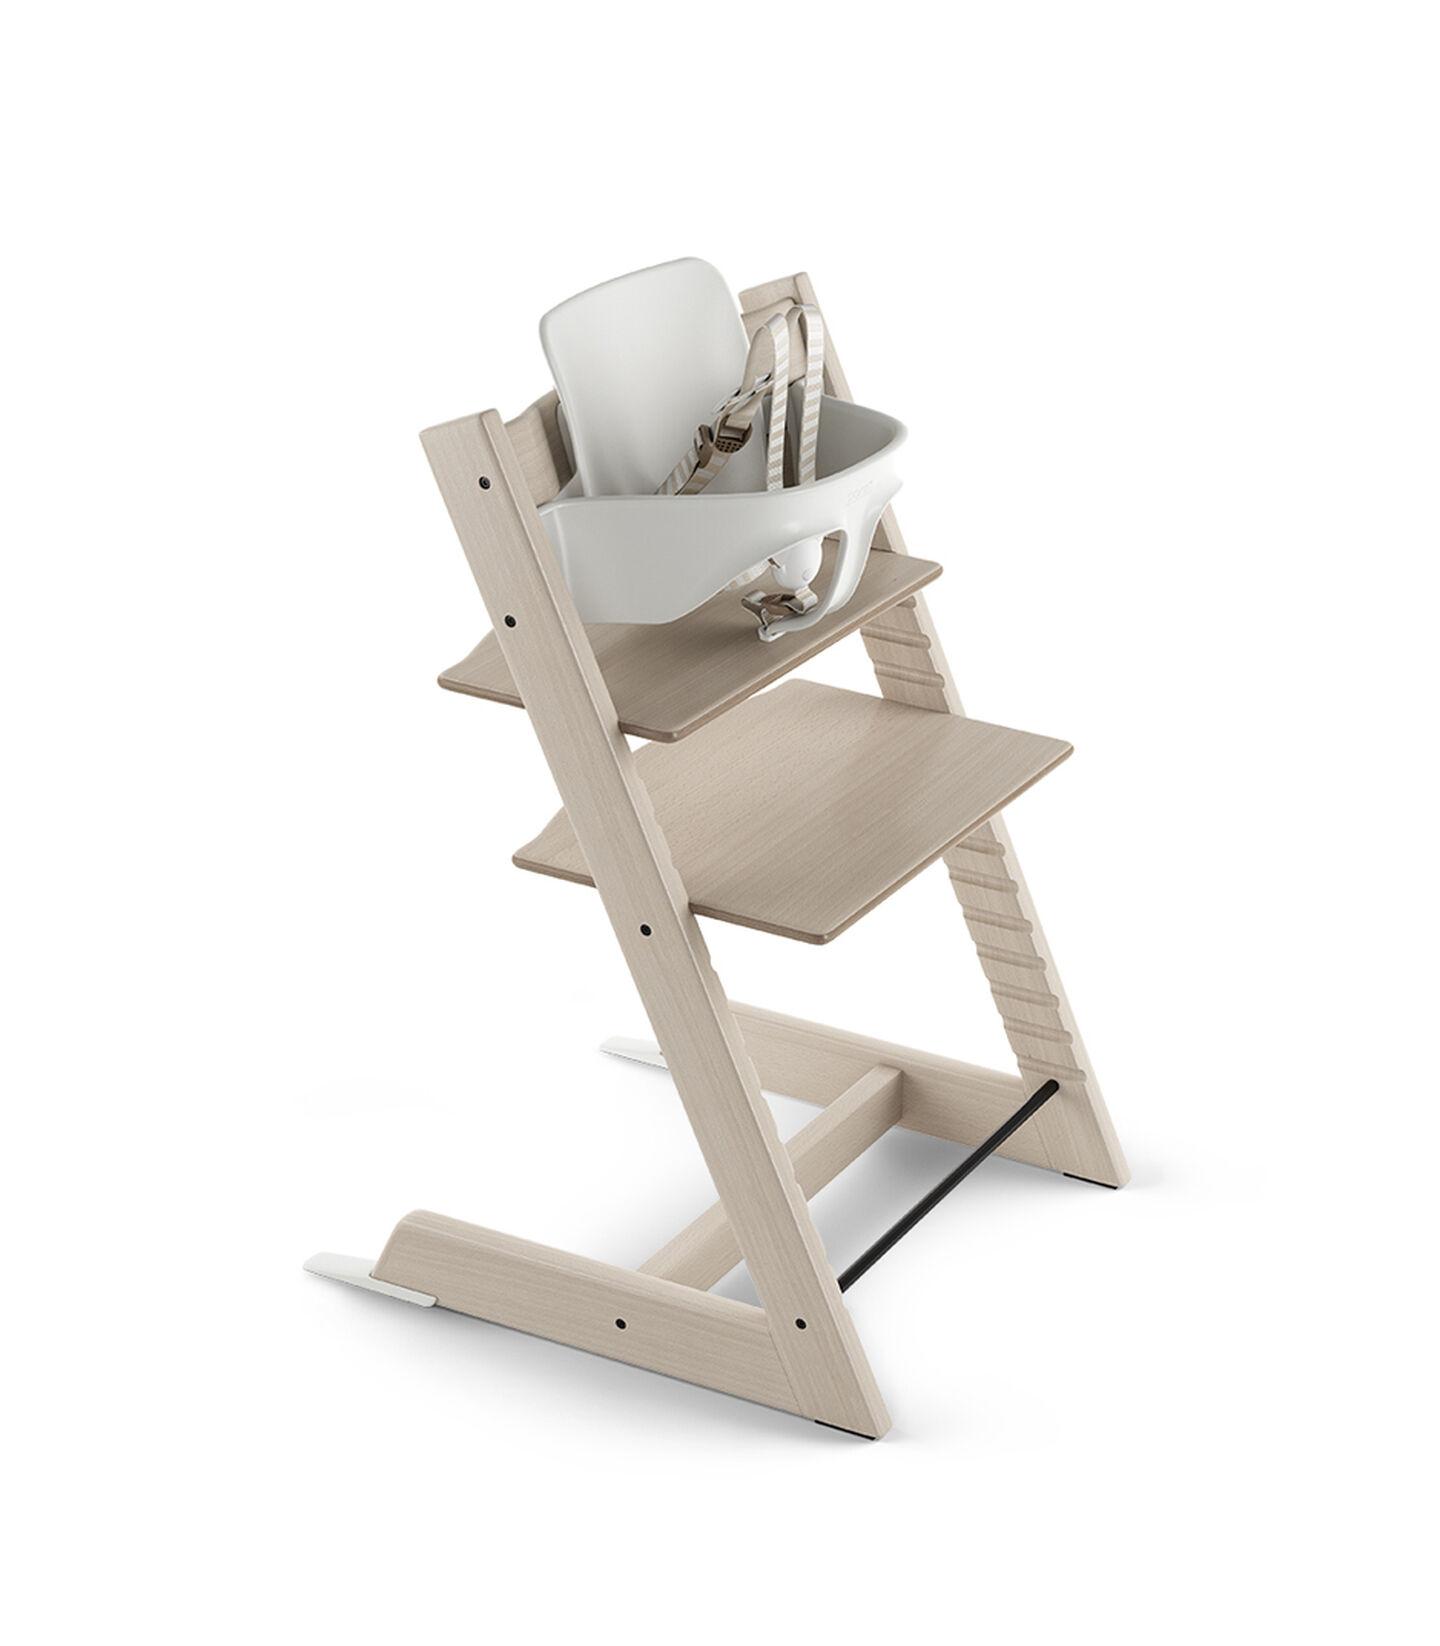 Tripp Trapp® Chair Whitewash with Baby Set. US version.